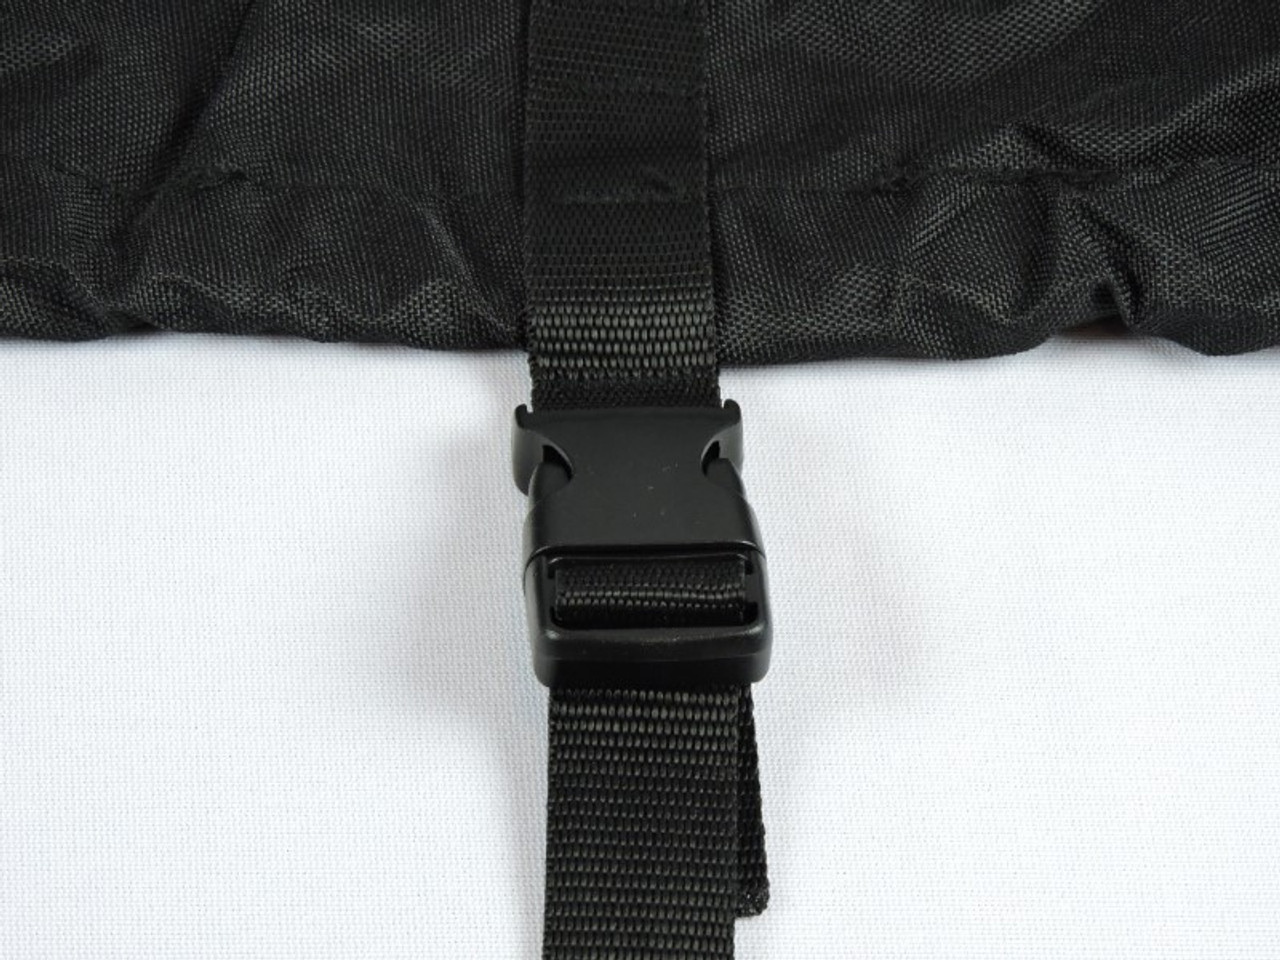 Nanook heavy duty trailering cover side tie down straps